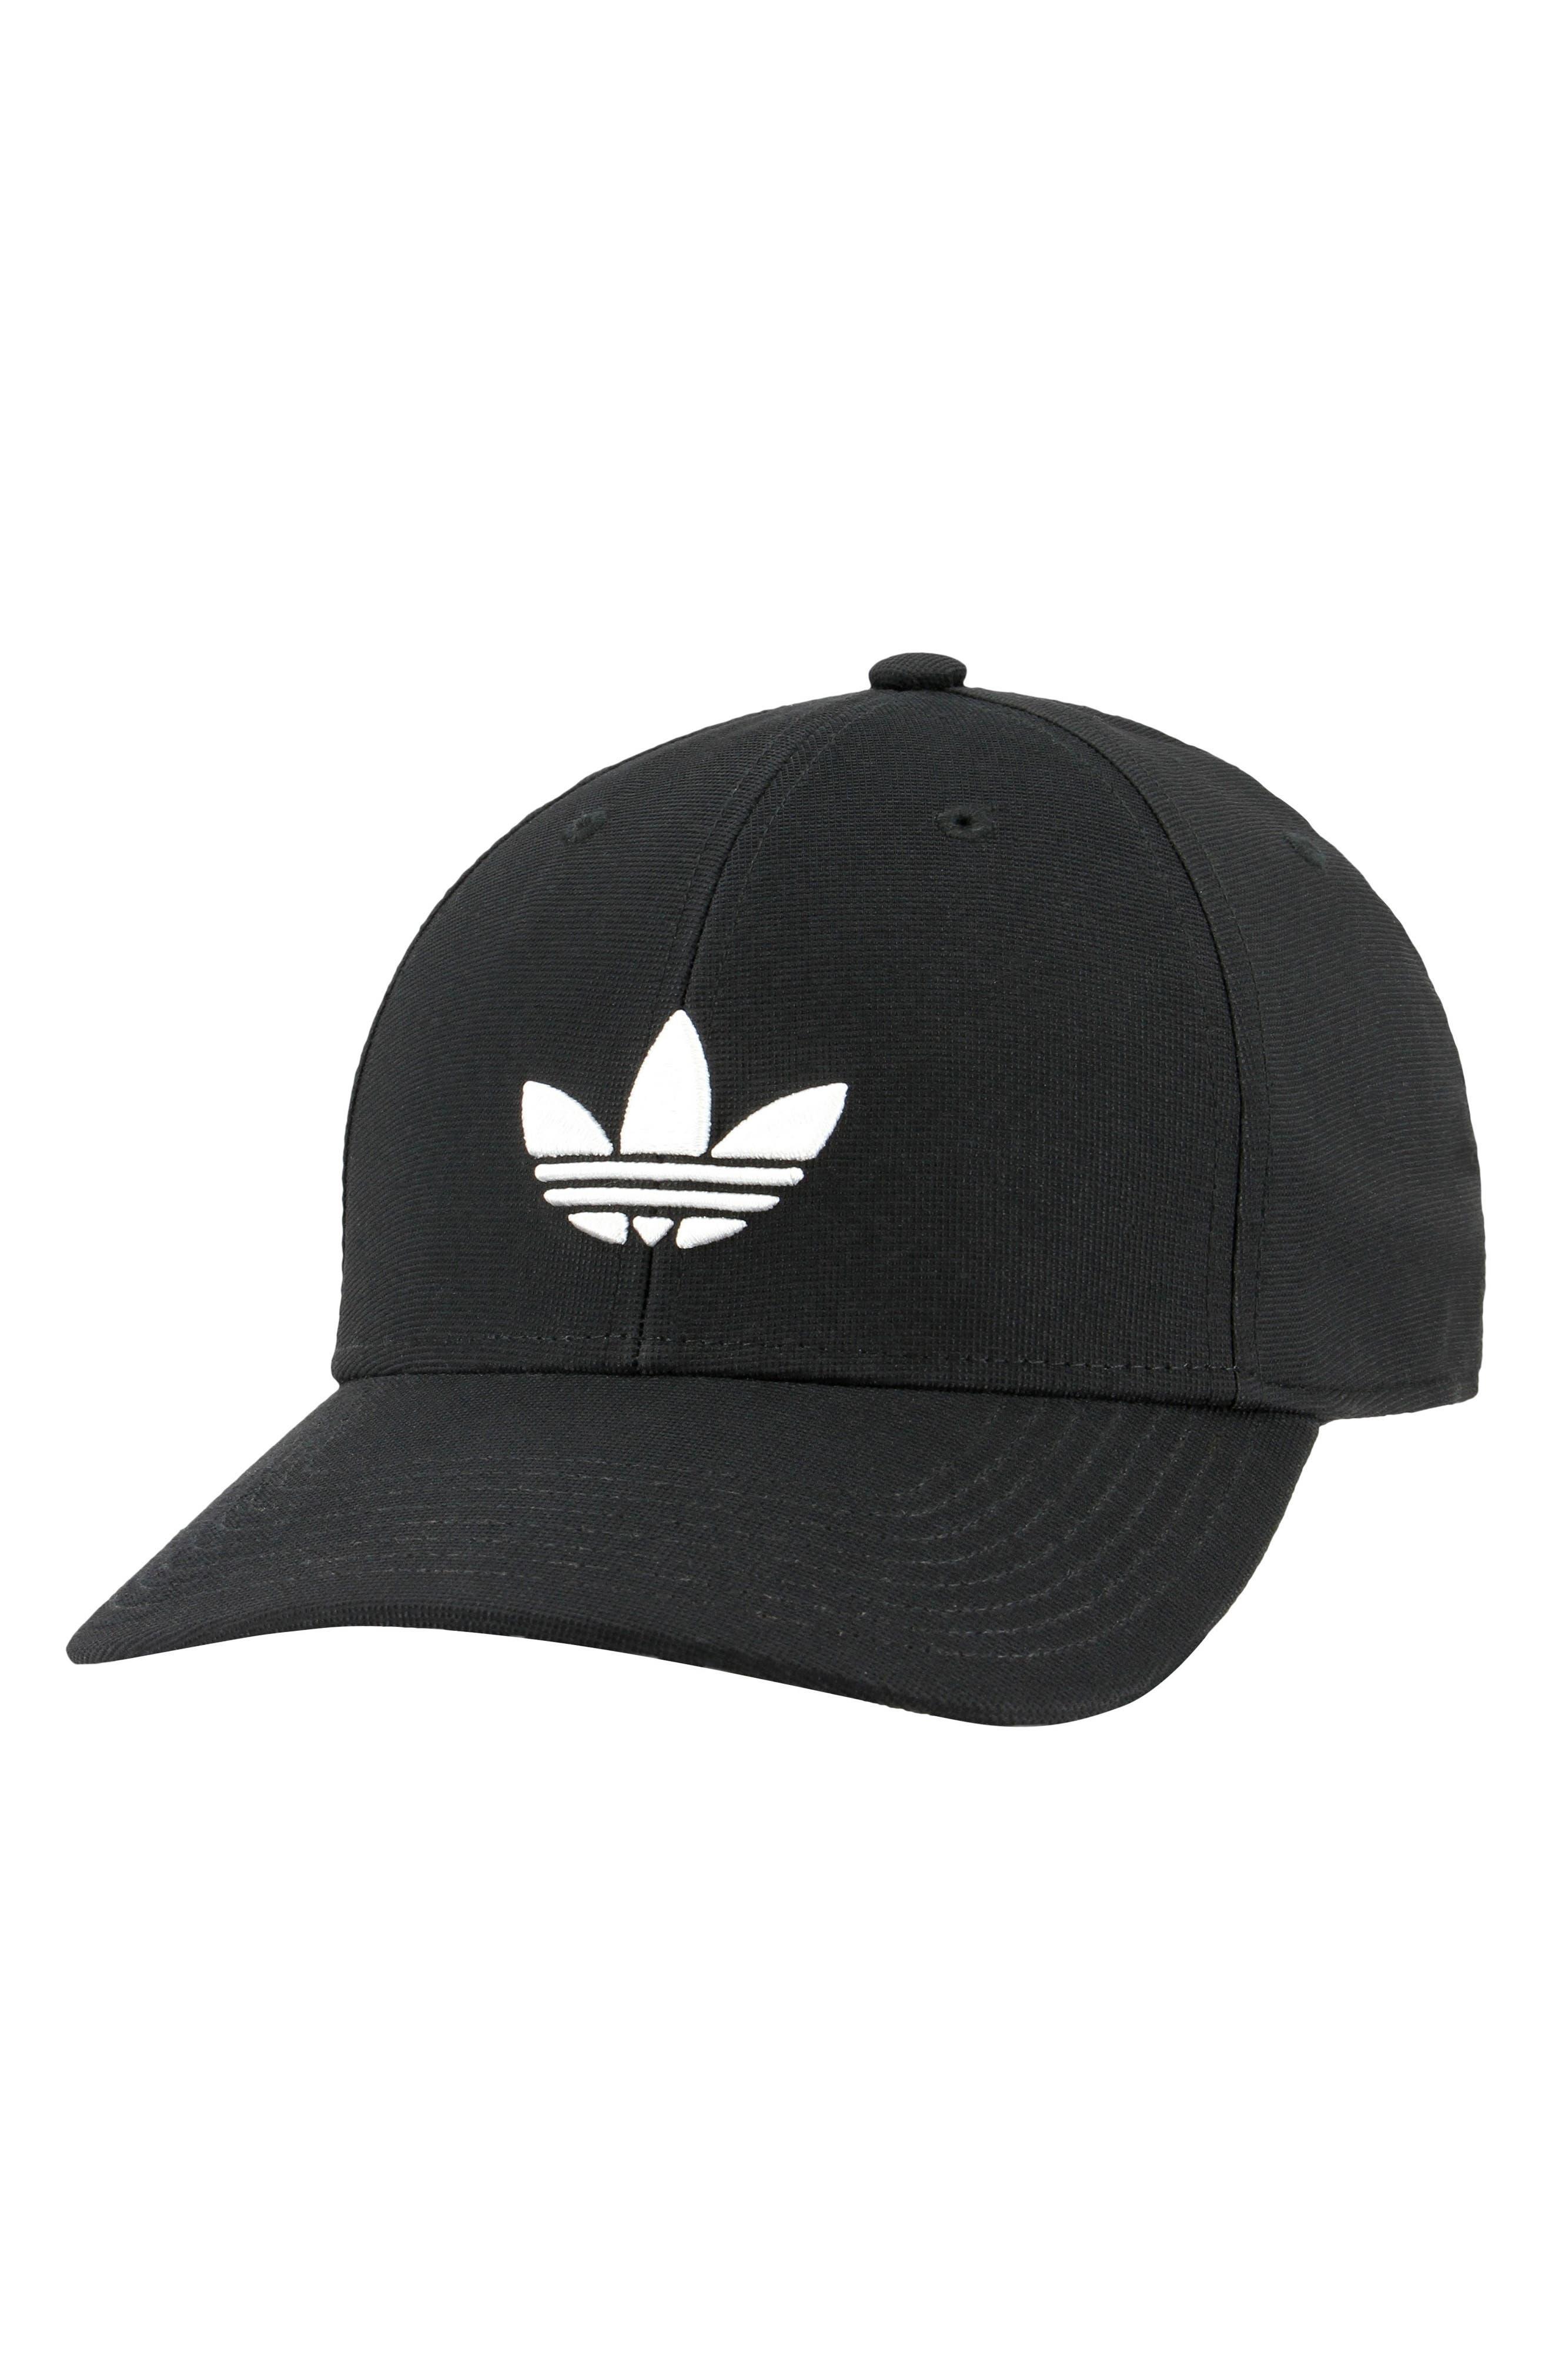 Trefoil Stretch Ball Cap,                             Main thumbnail 1, color,                             Black/ White